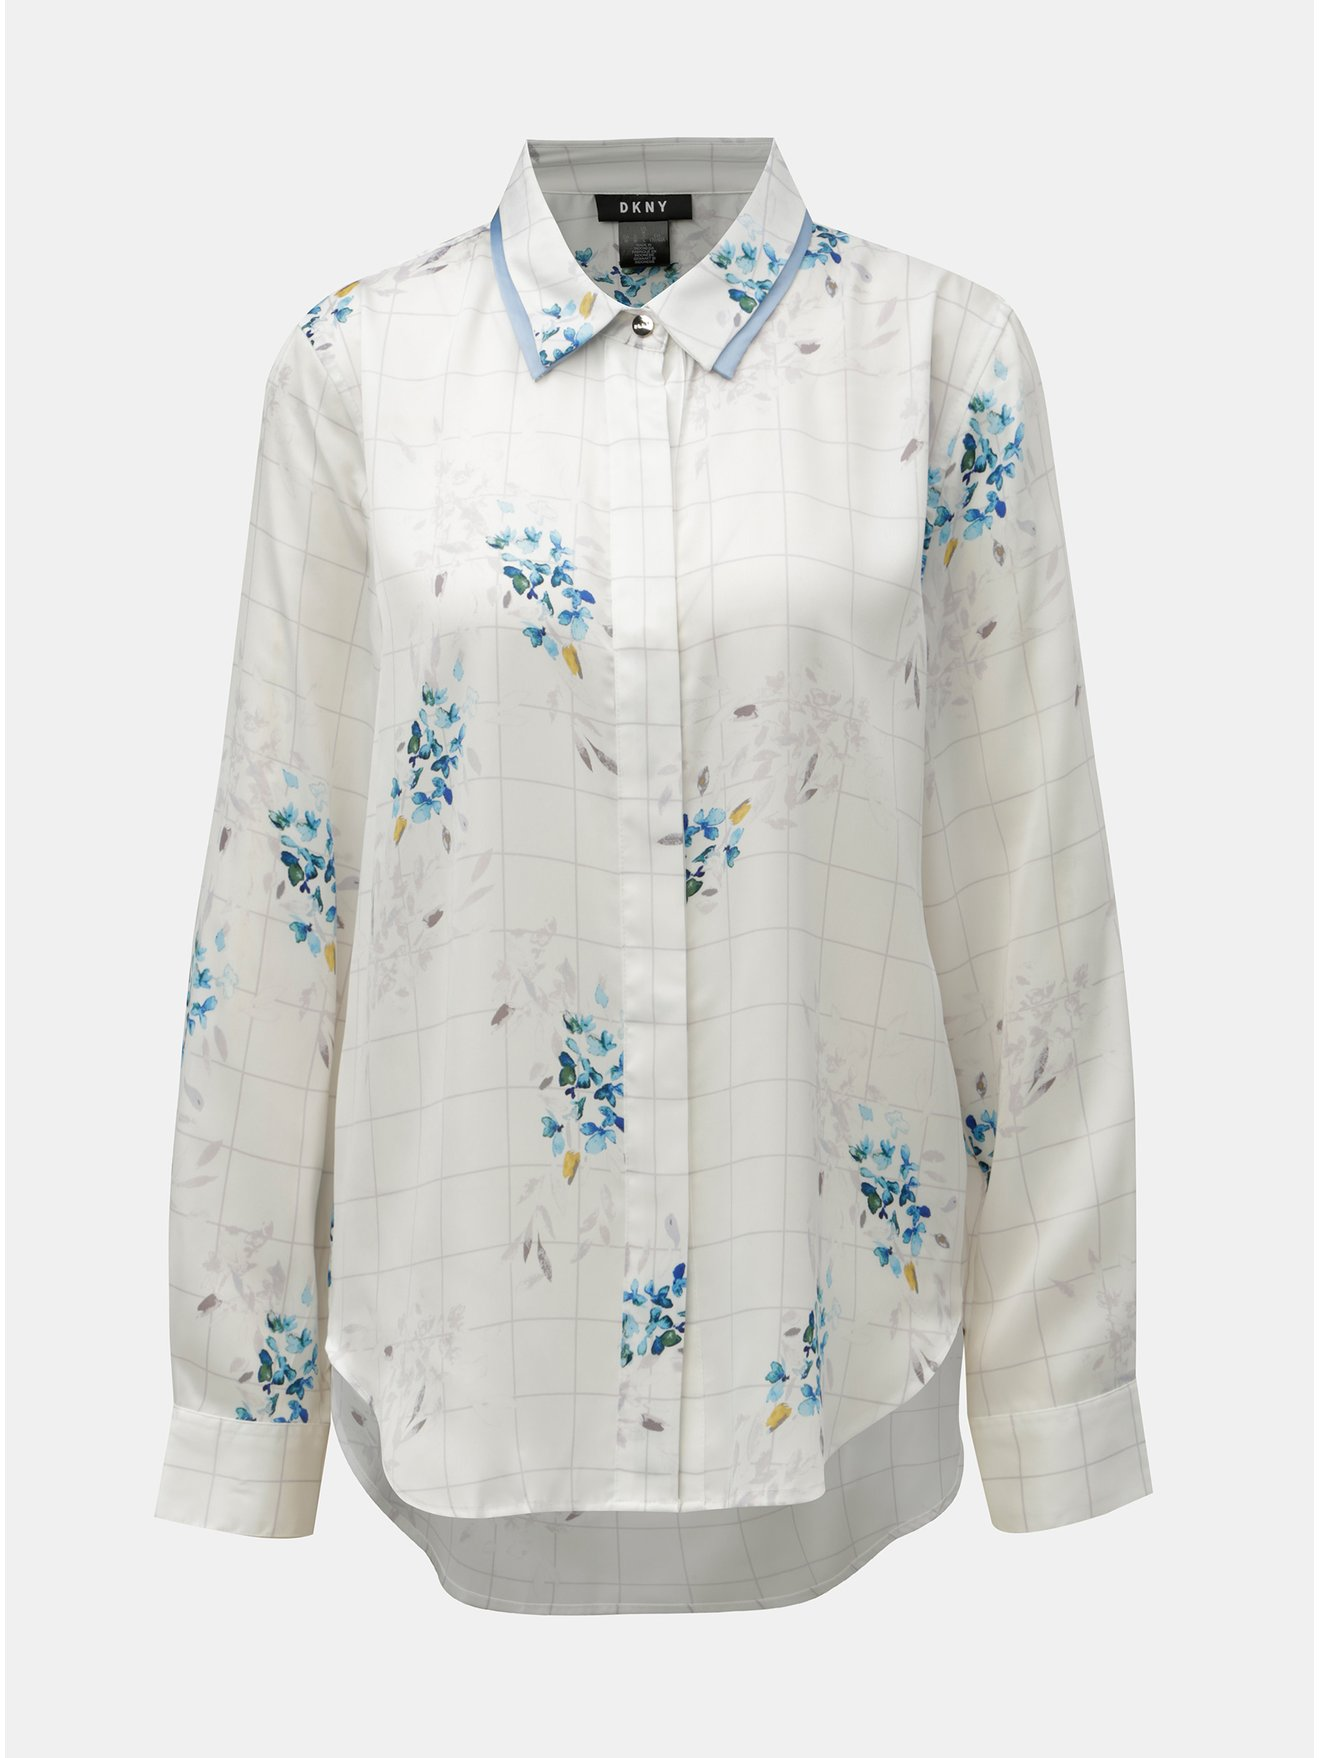 Modro-bílá kostkovaná květovaná košile DKNY 0e9190fbd8